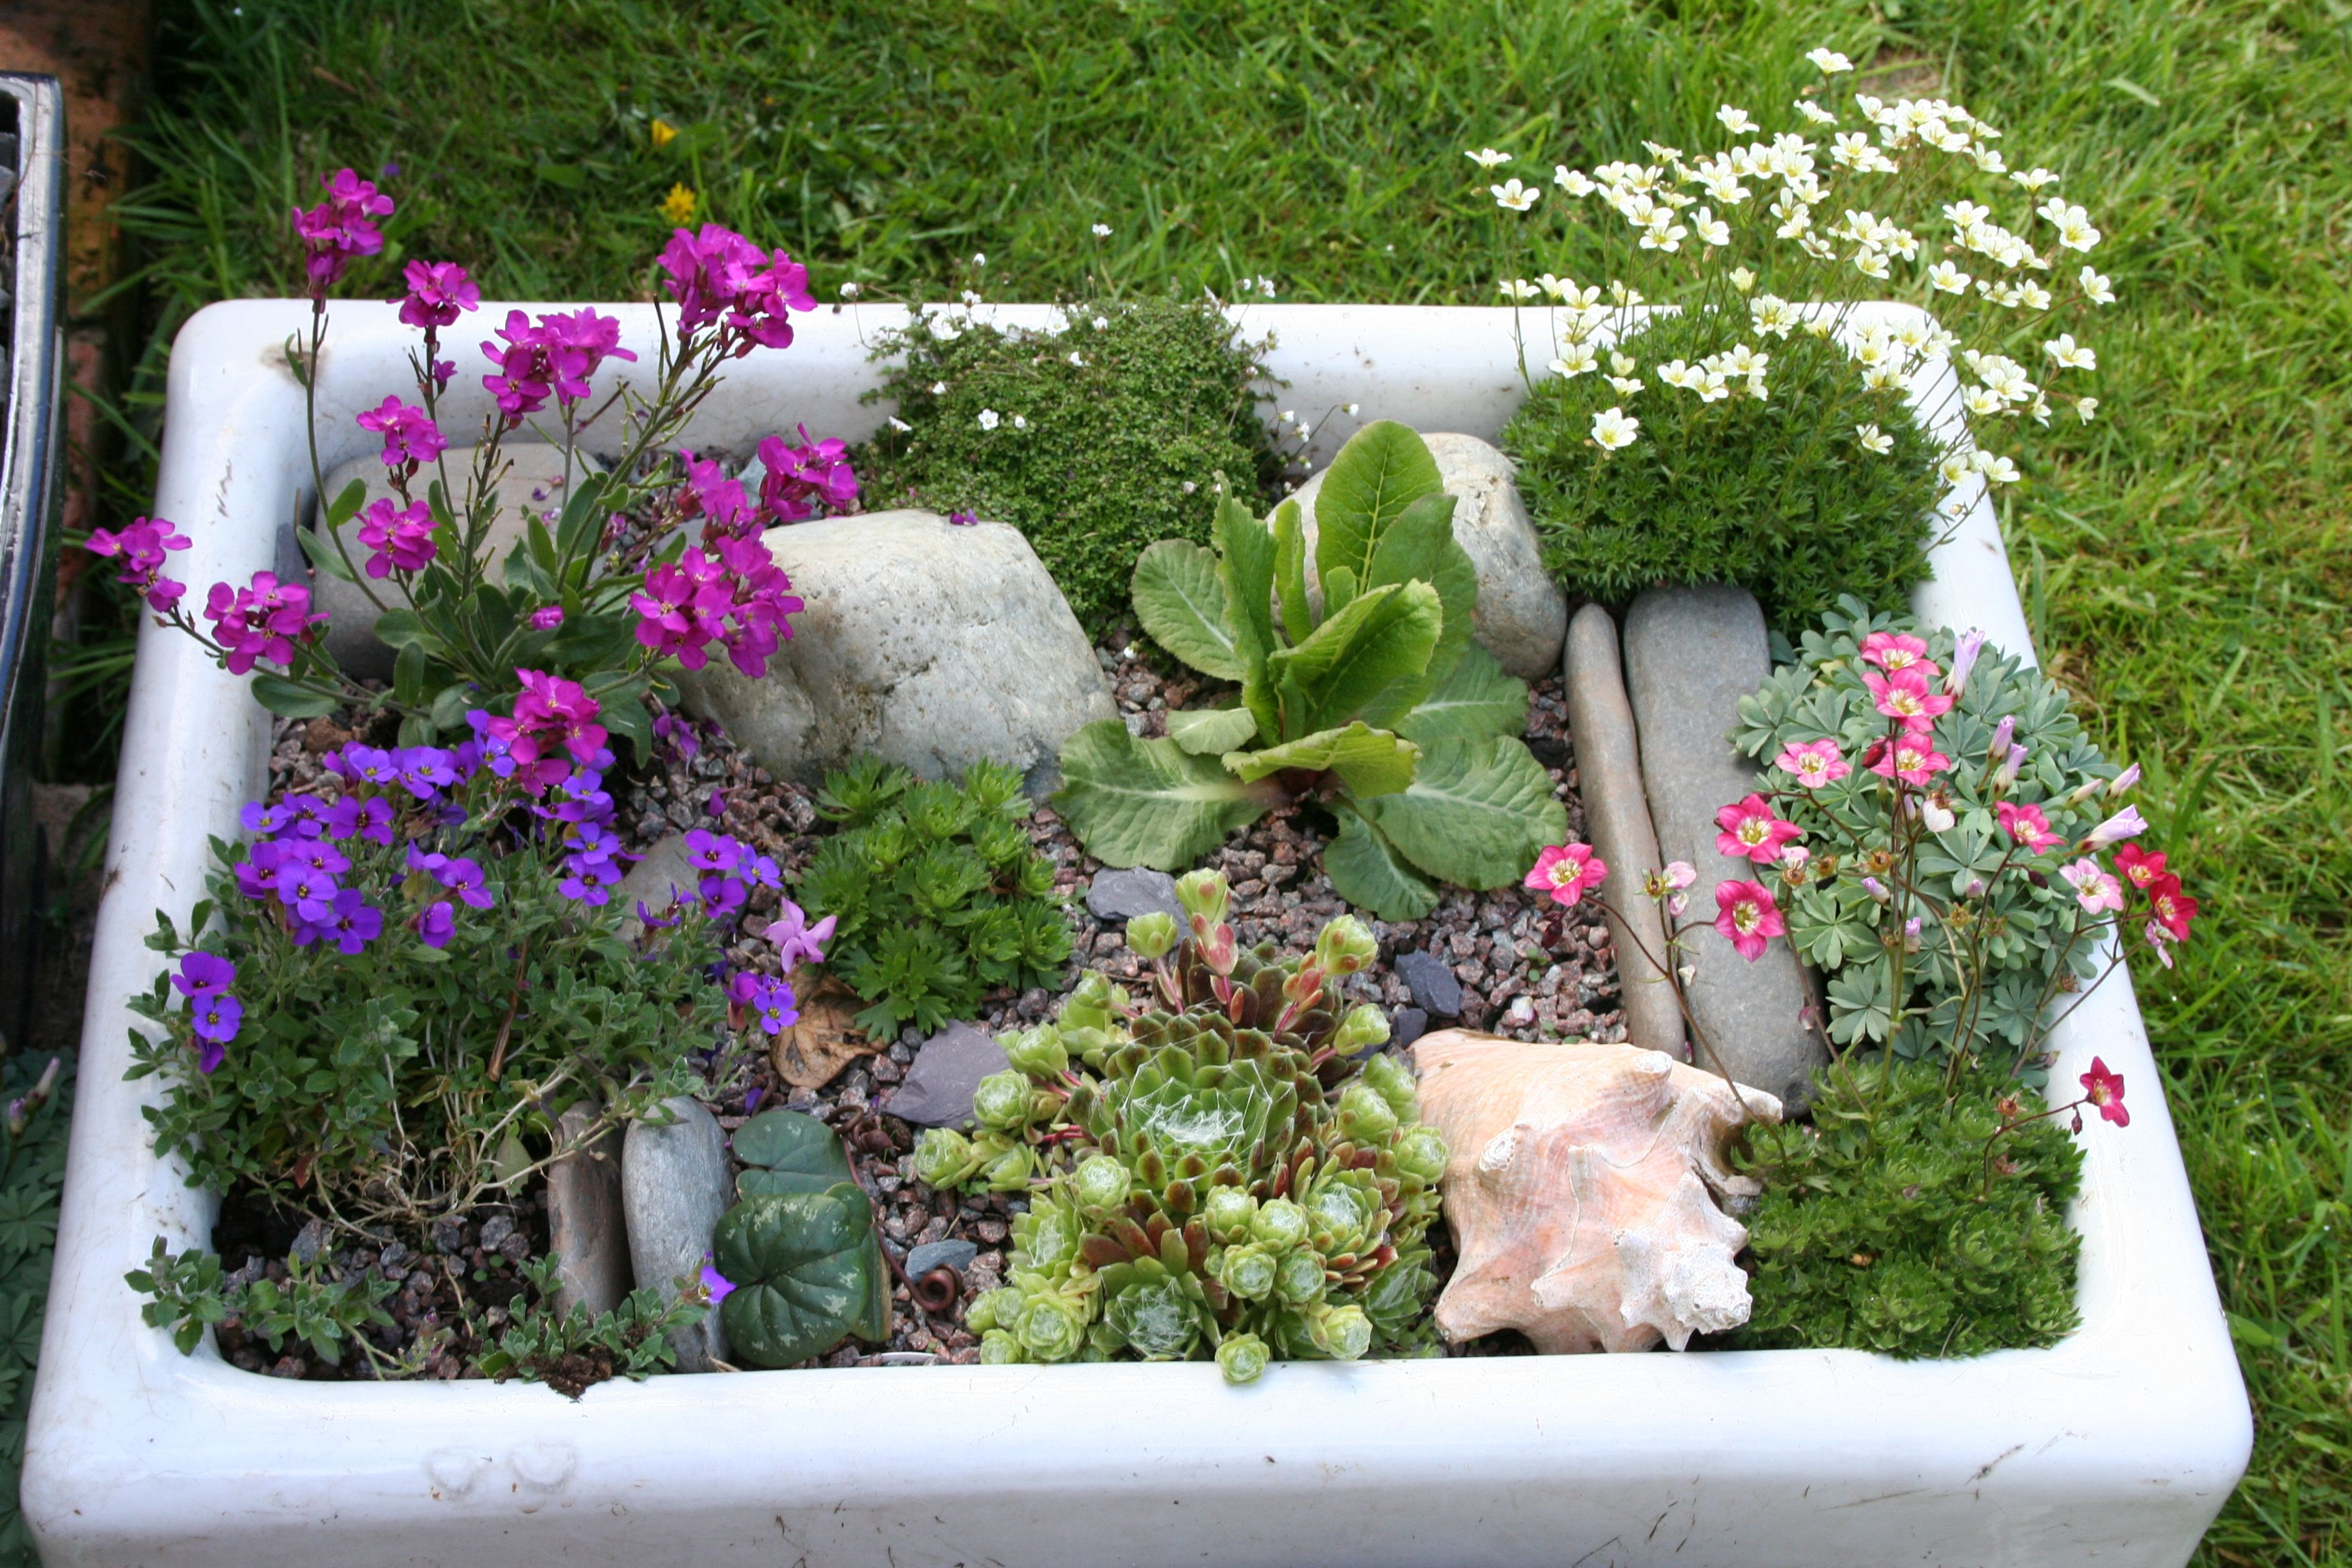 Alpine Garden In Belfast Sink What A Neat Idea For An